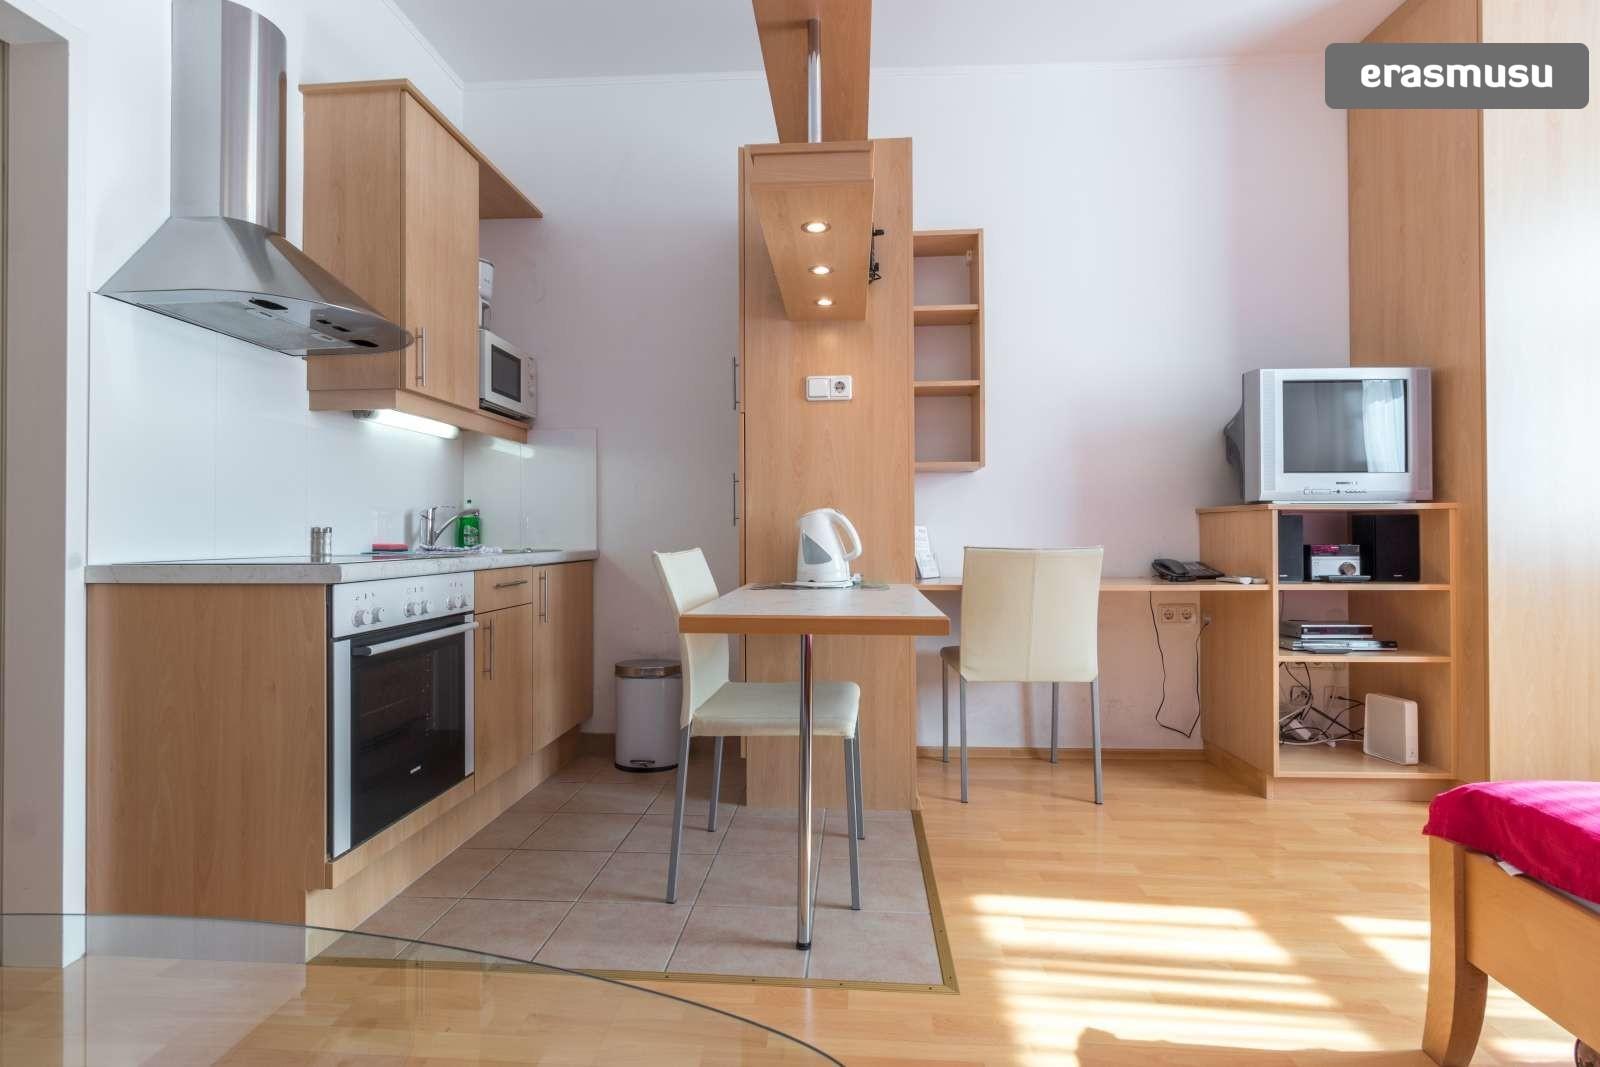 sunny-studio-apartment-rent-near-bohemian-prater-favoriten-25751